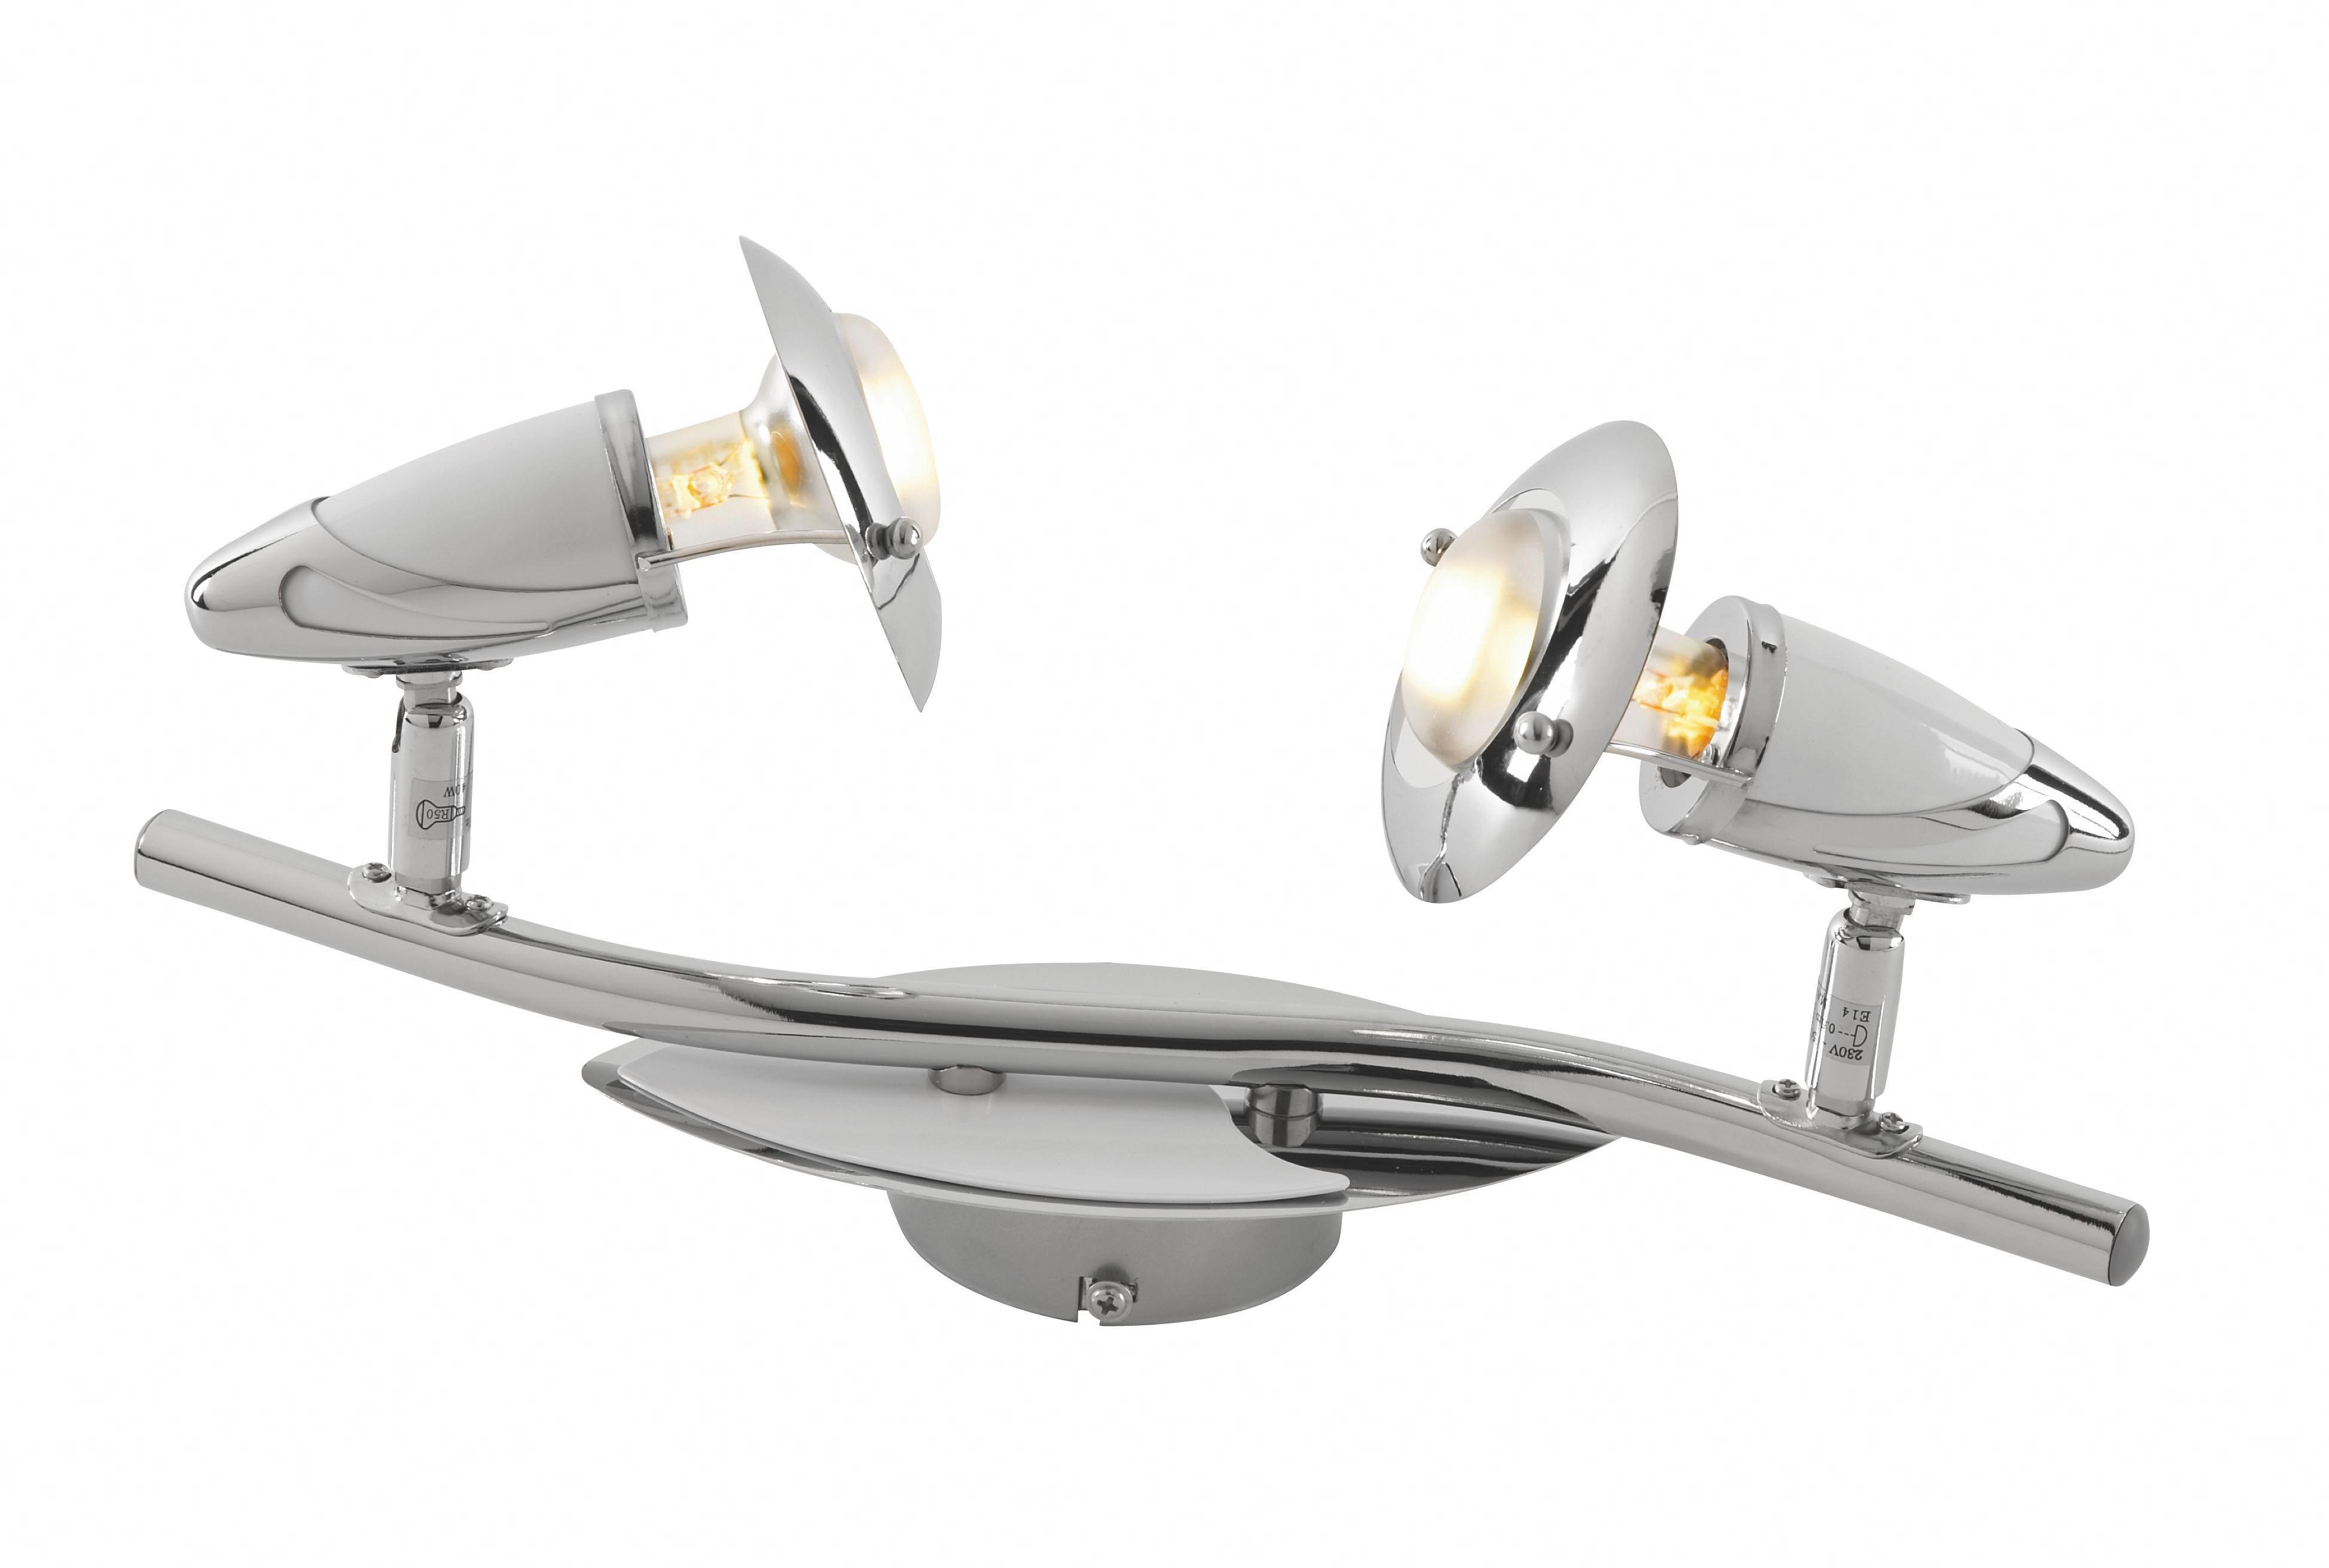 Reflektor Lord - bela/krom, Trendi, kovina (40cm) - MÖMAX modern living